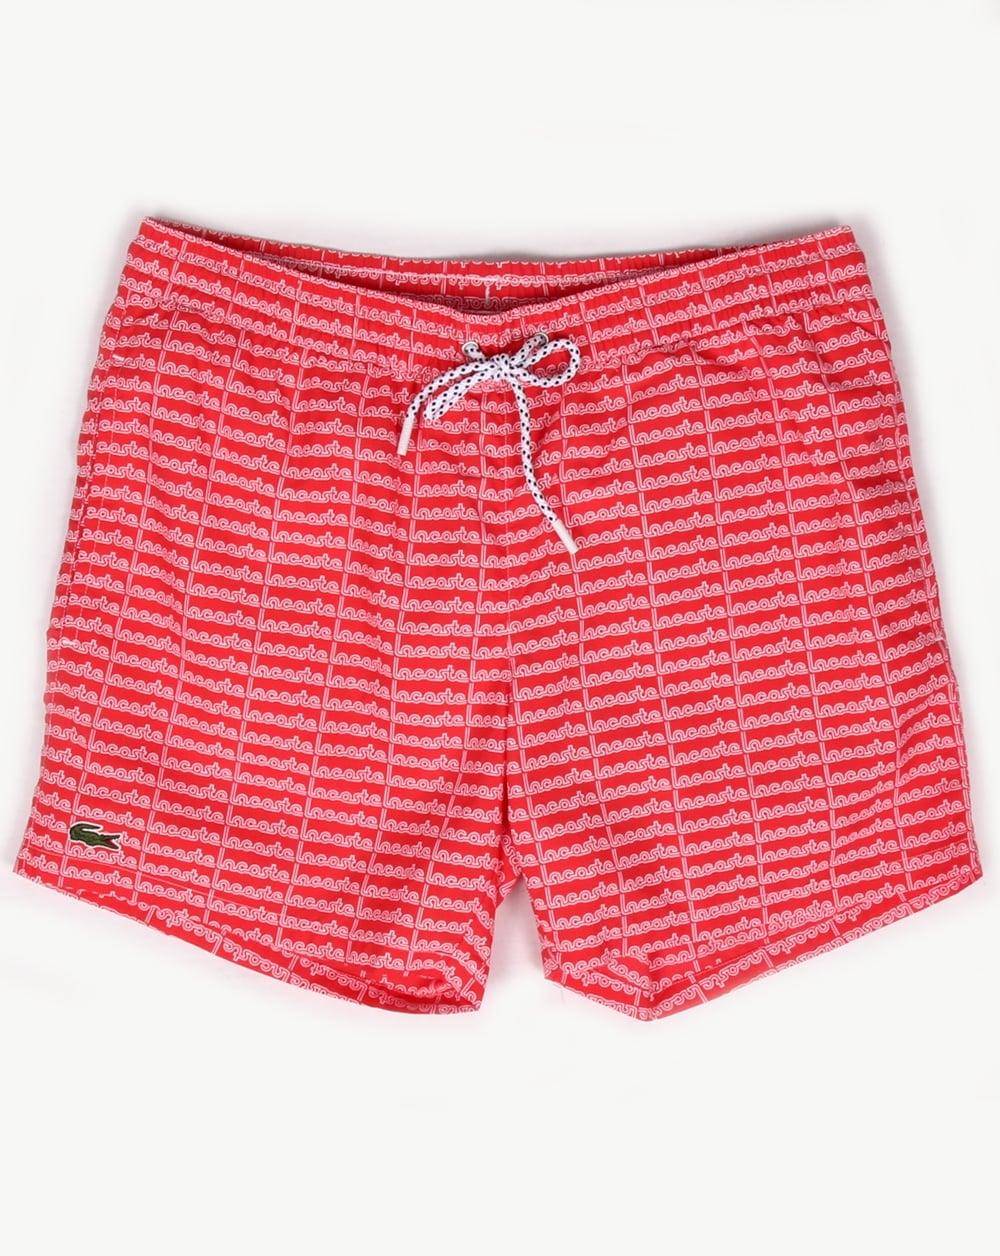 cb4fa7a014 Lacoste Linear Logo Swim Shorts Grenadine, Men's, Swimmers,Pool,Trunks